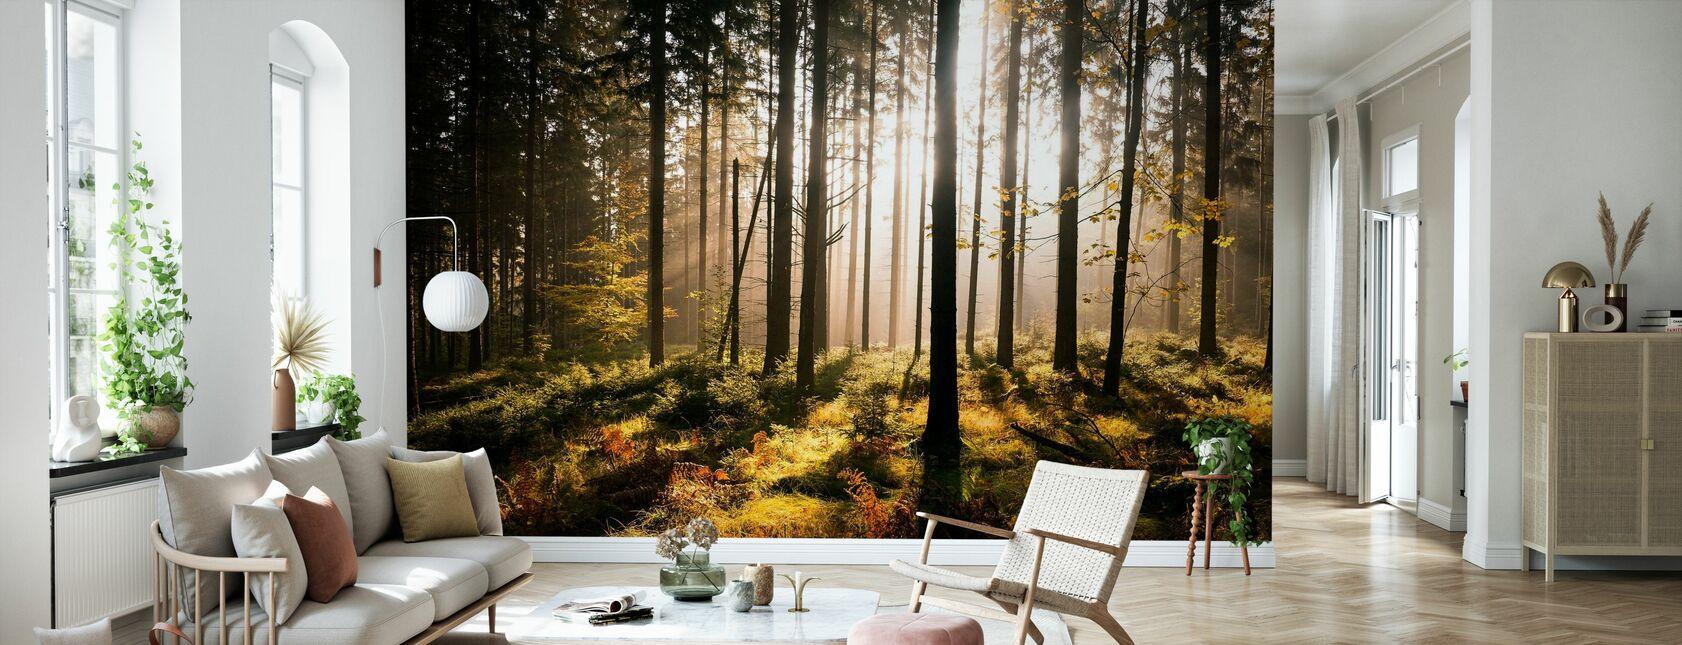 Herfst bos met zonnestralen - Behang - Woonkamer